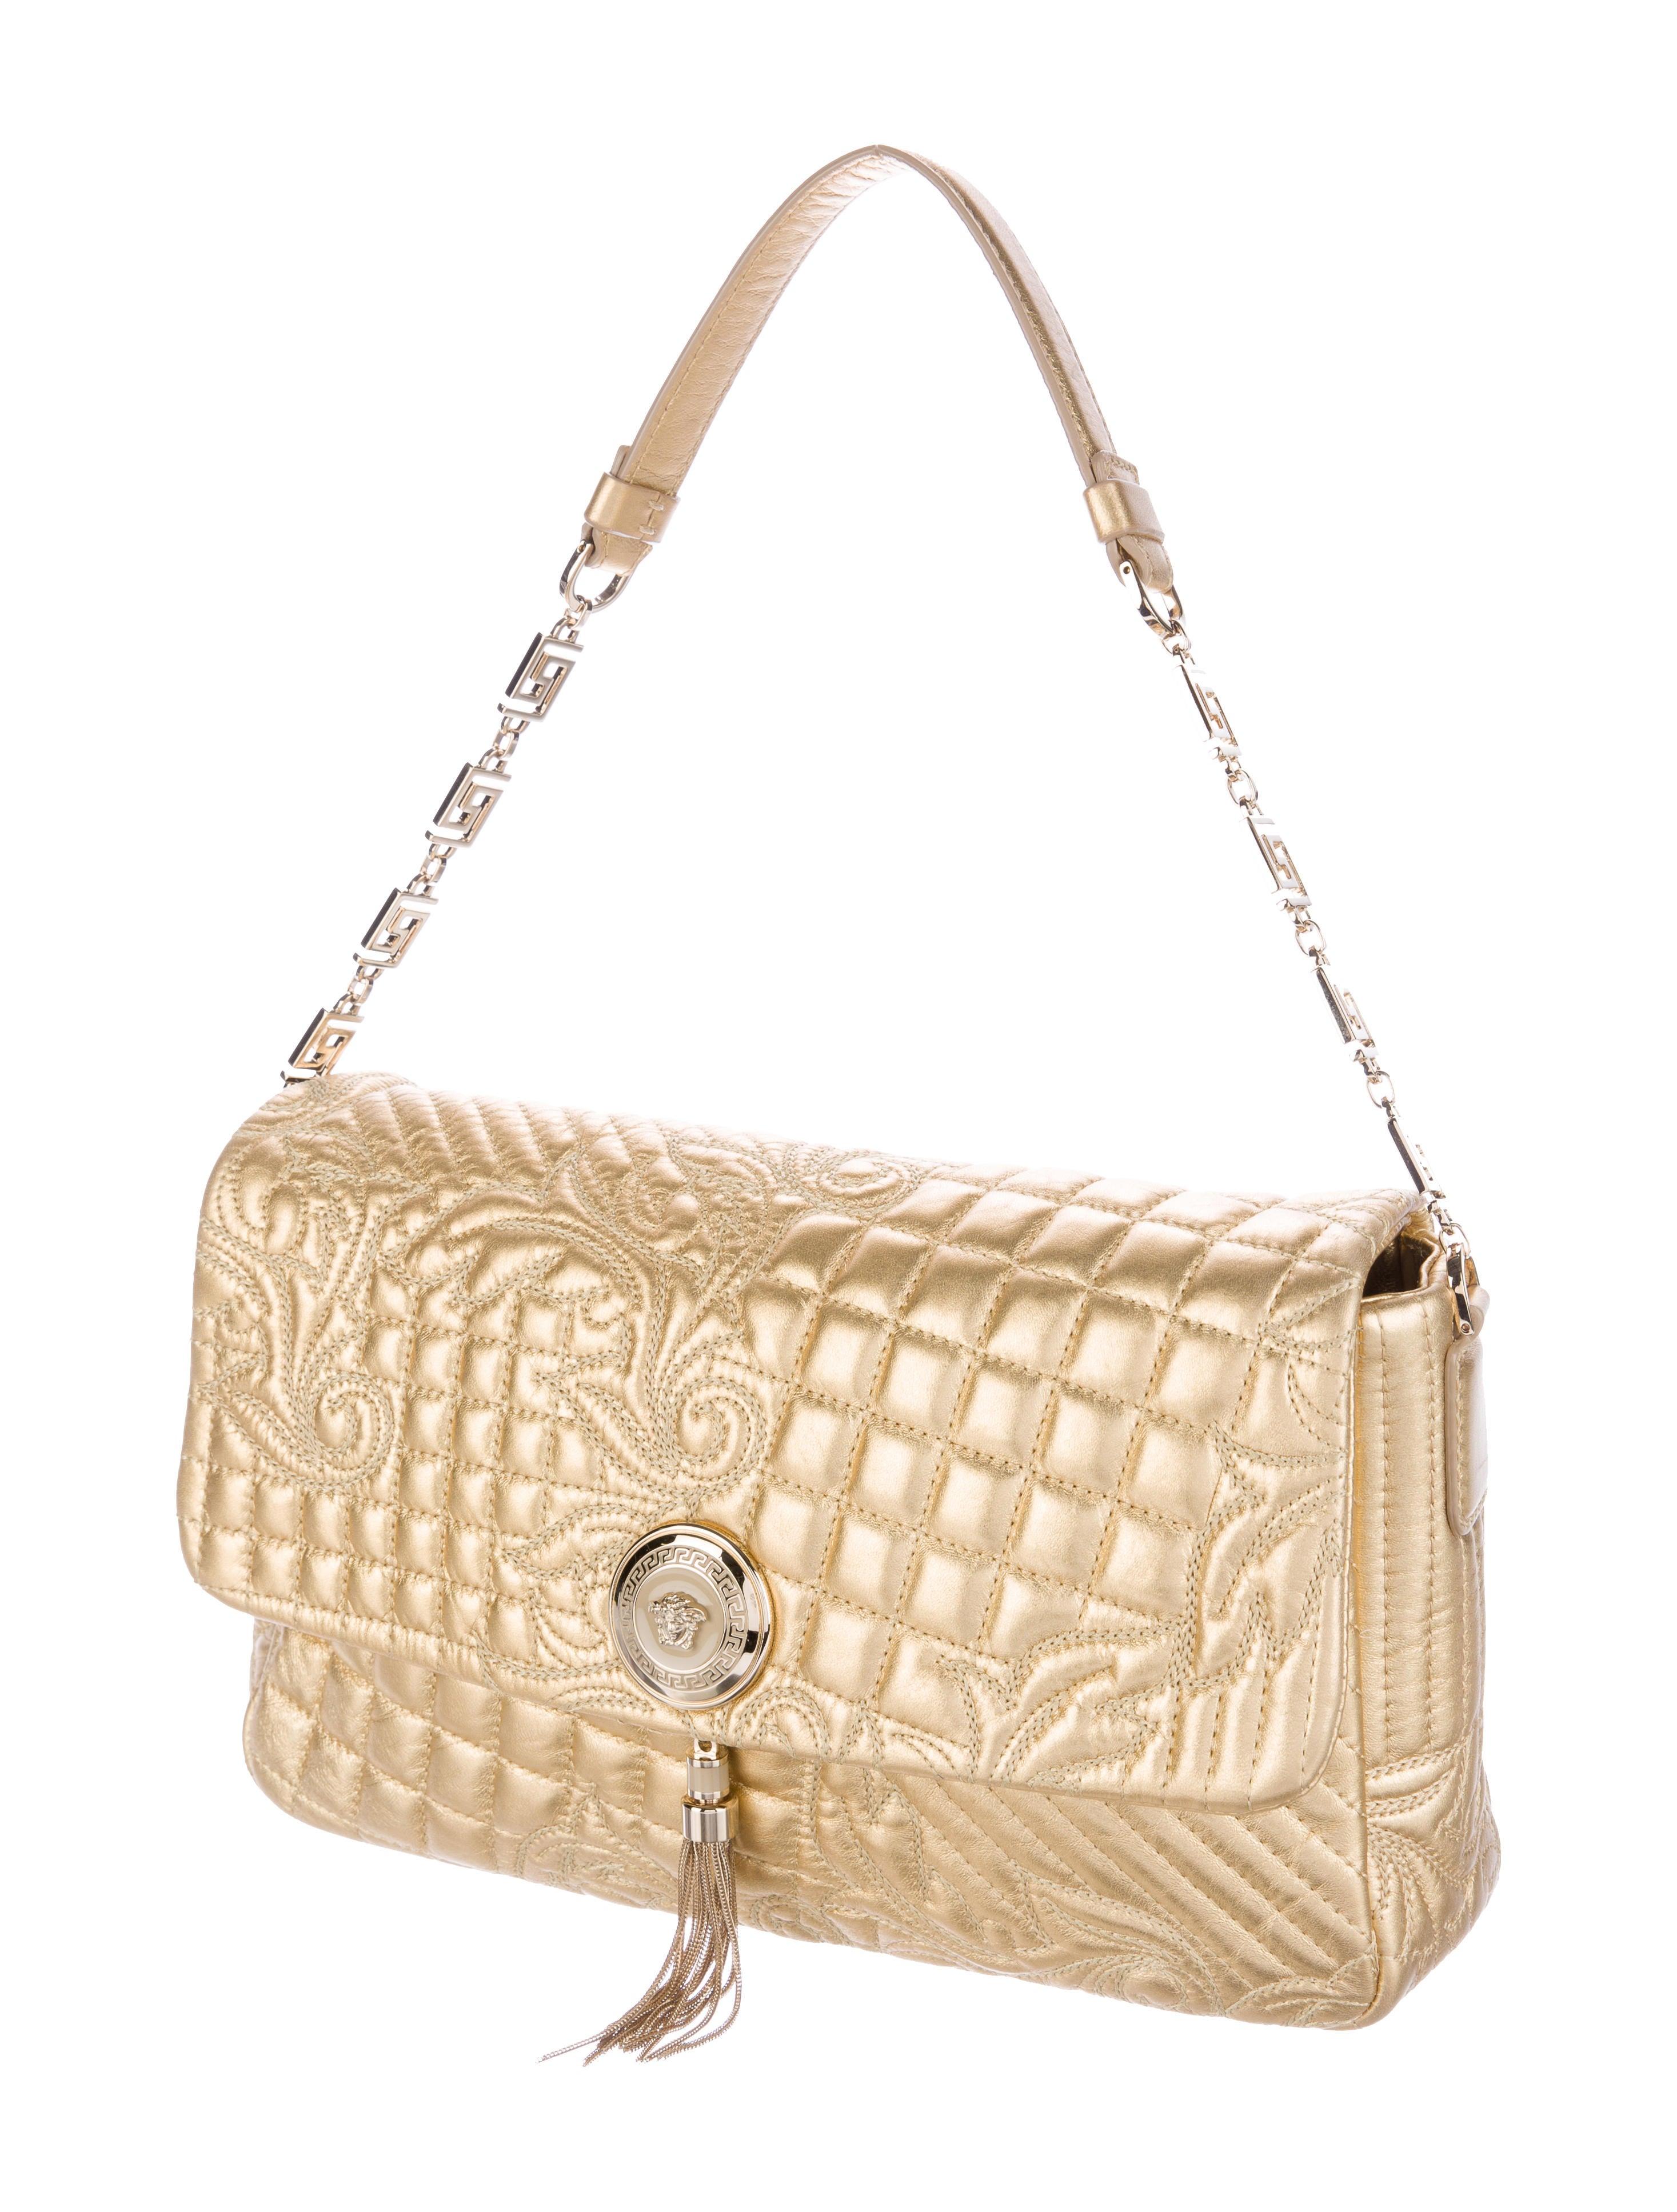 2a585494488f Versace metallic calliope vanitas bag handbags jpg 2934x3871 Versace  vanitas bag